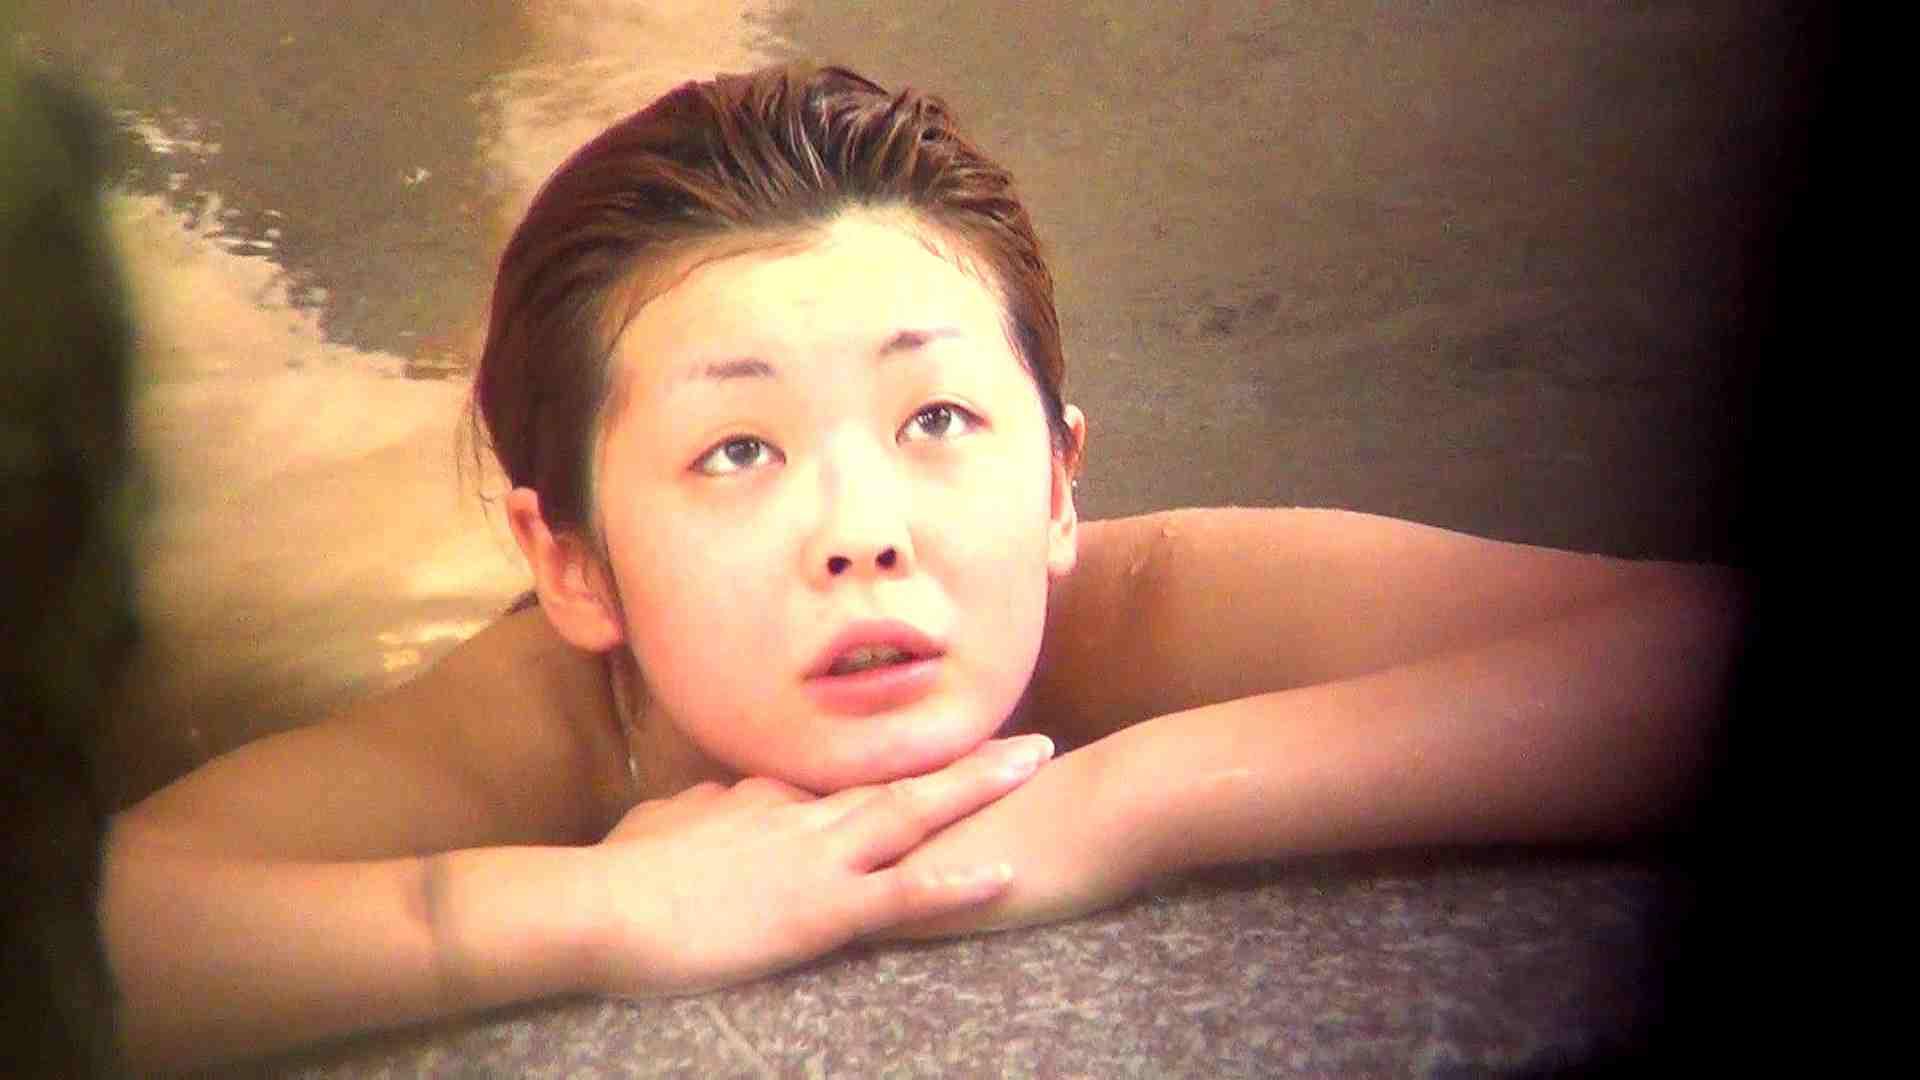 Aquaな露天風呂Vol.288 露天  85連発 69